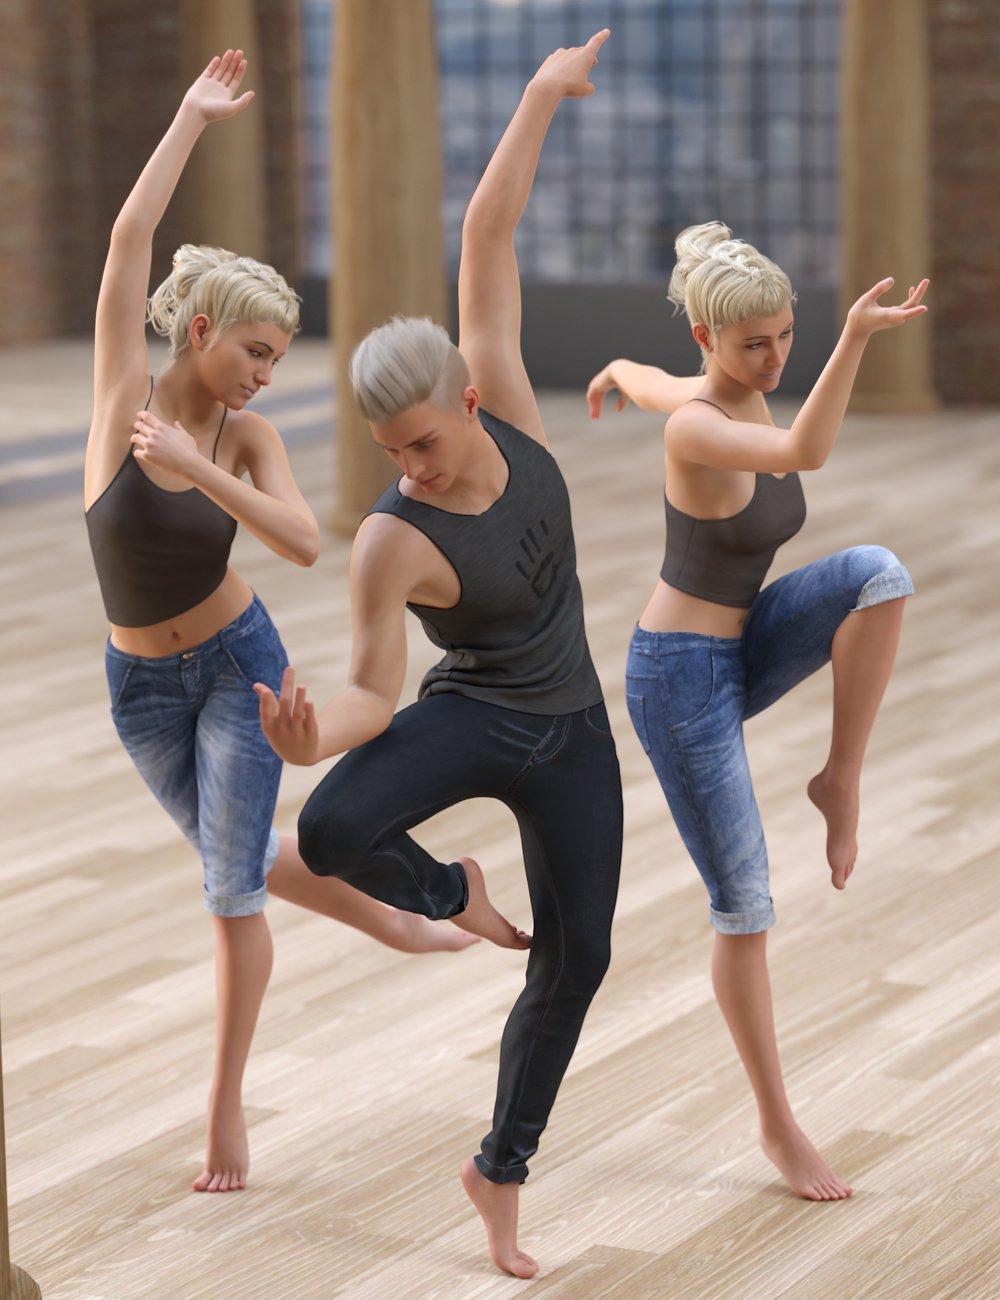 Modern Dance Troupe Poses for Genesis 8 by: FeralFey, 3D Models by Daz 3D